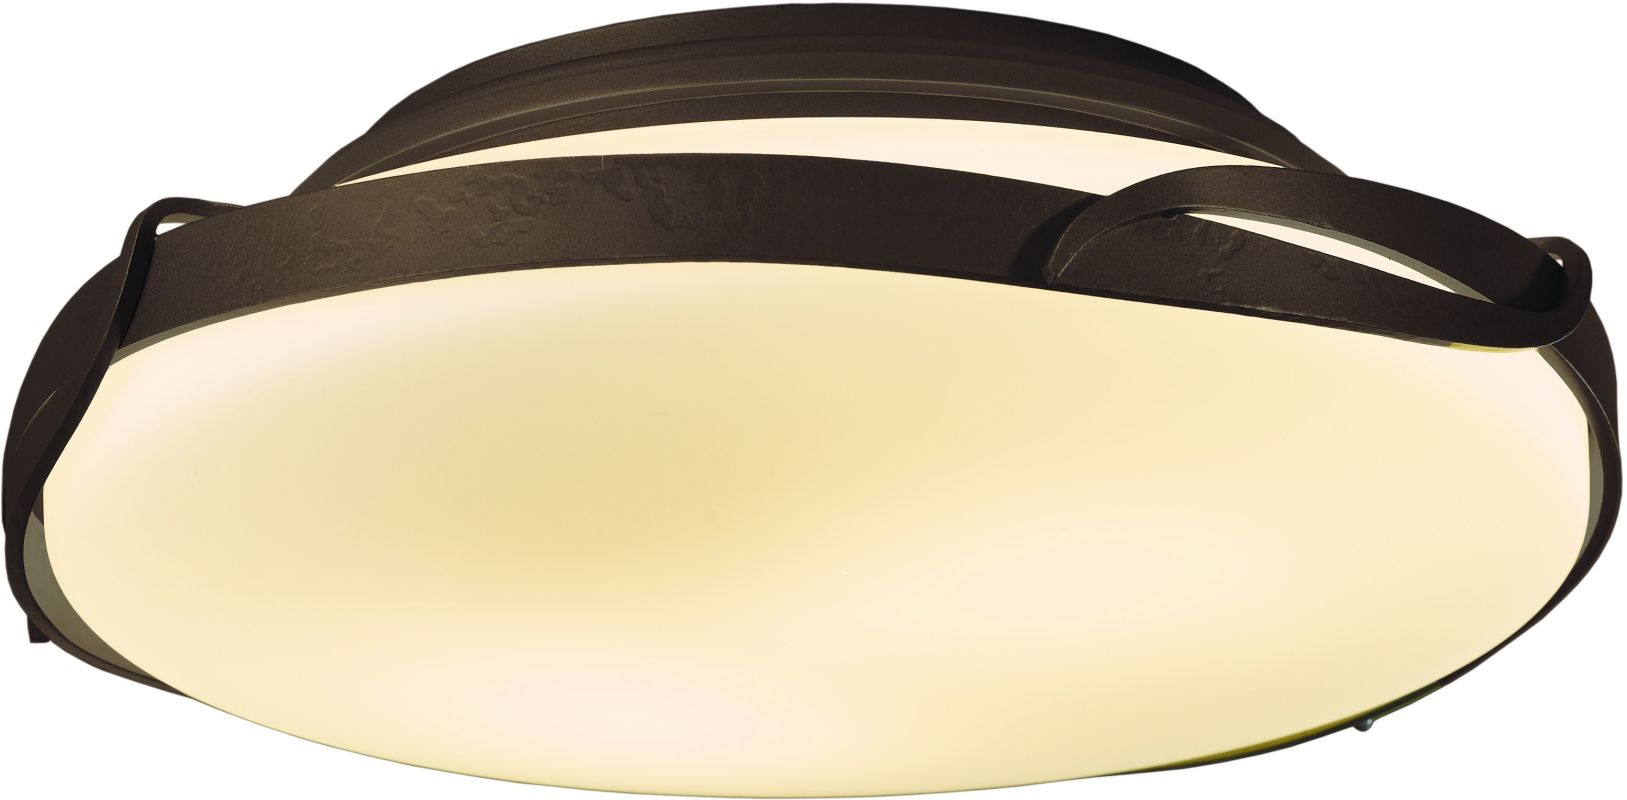 Hubbardton Forge 126740 2 Light Semi-Flush Ceiling Light from the Sale $431.20 ITEM#: 2007249 MODEL# :126740-03 :